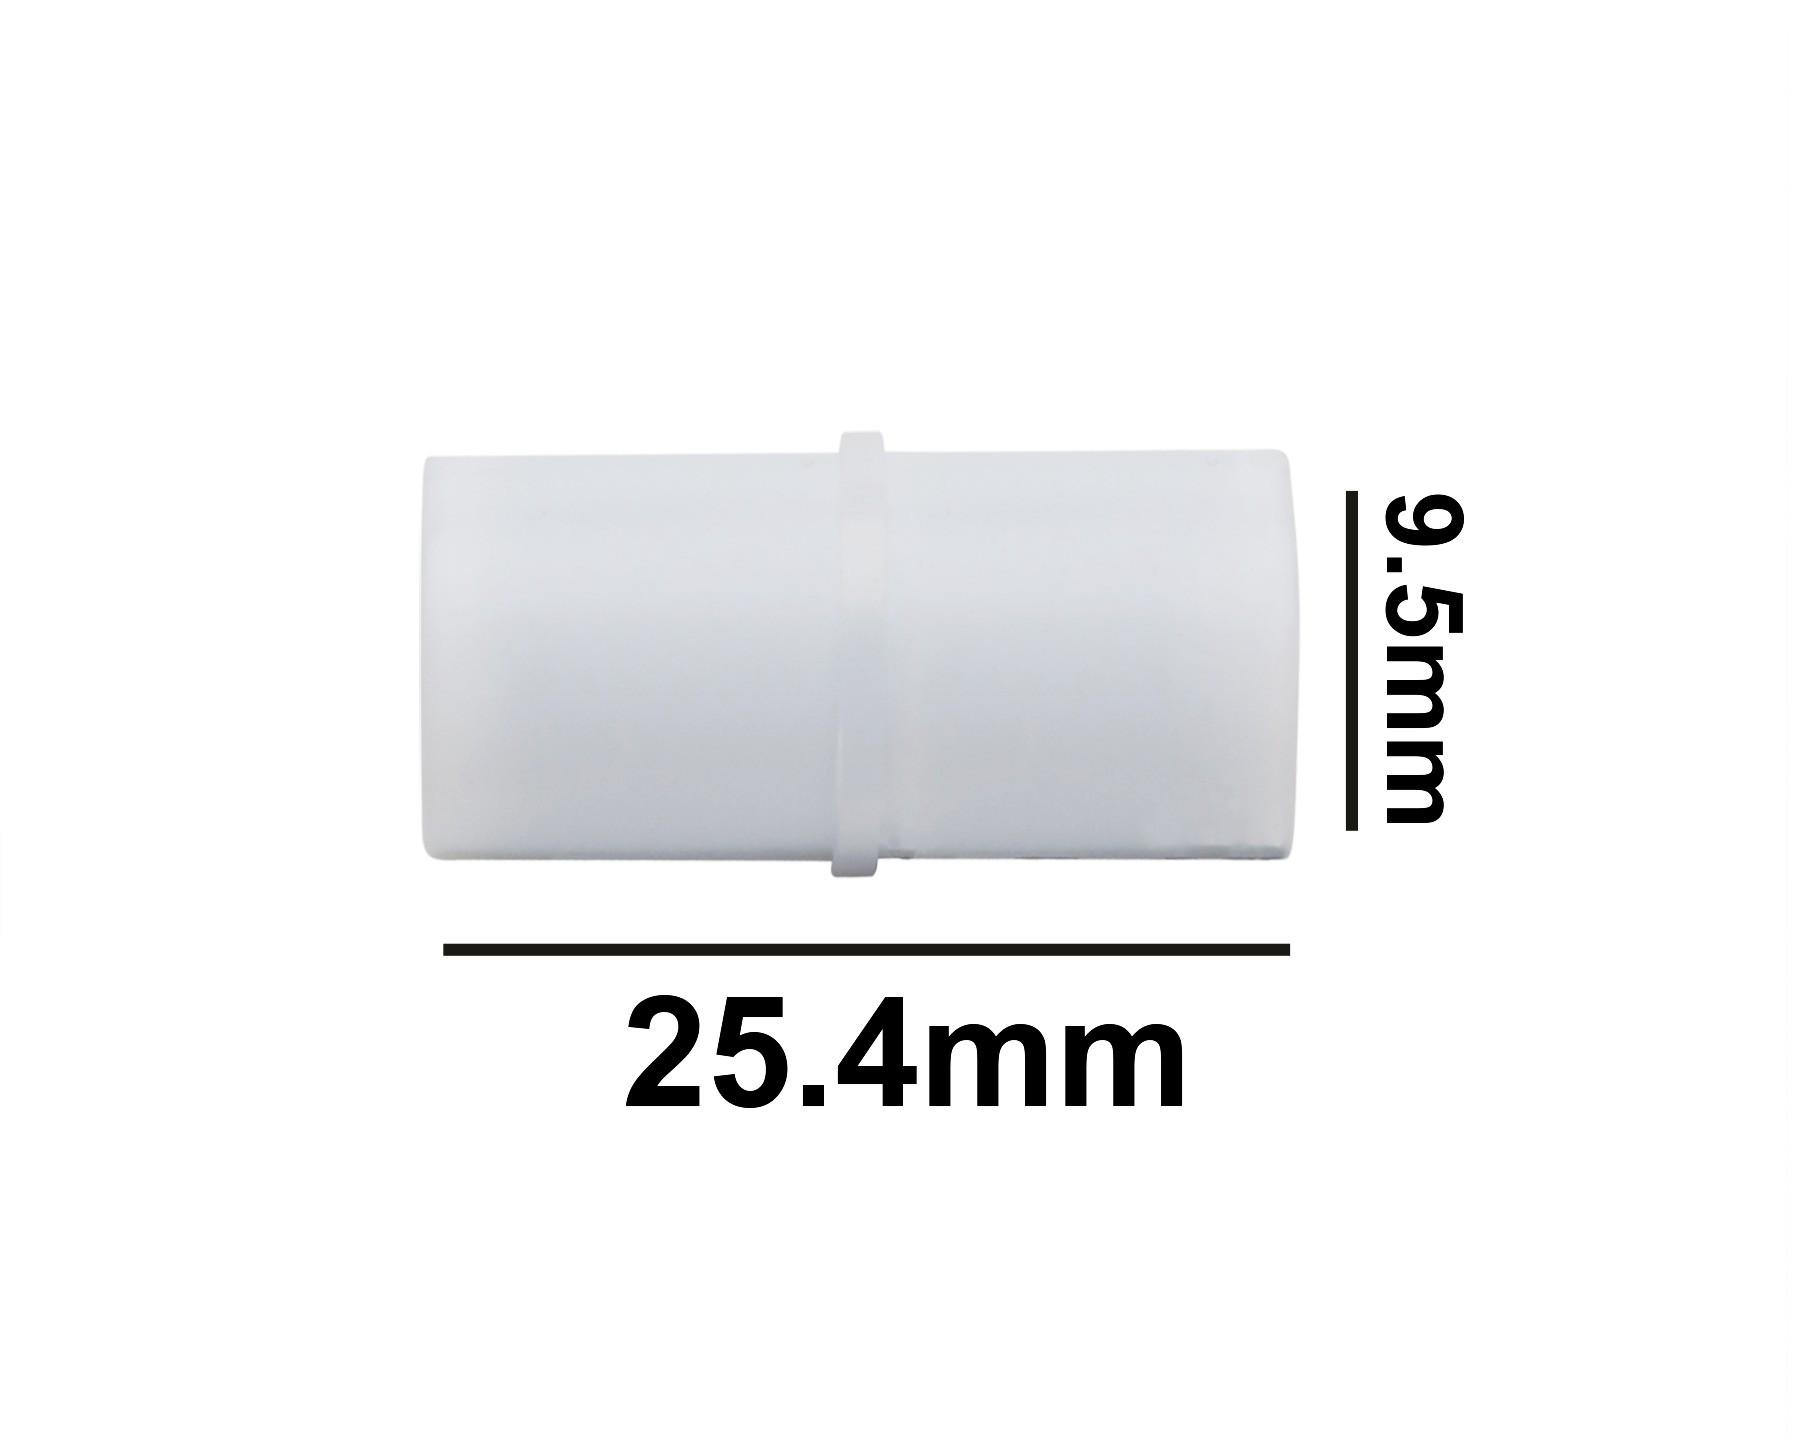 SP Bel-Art Spinbar Teflon Cylindrical Magnetic Stirring Bar; 25.4 x 9.5mm, White